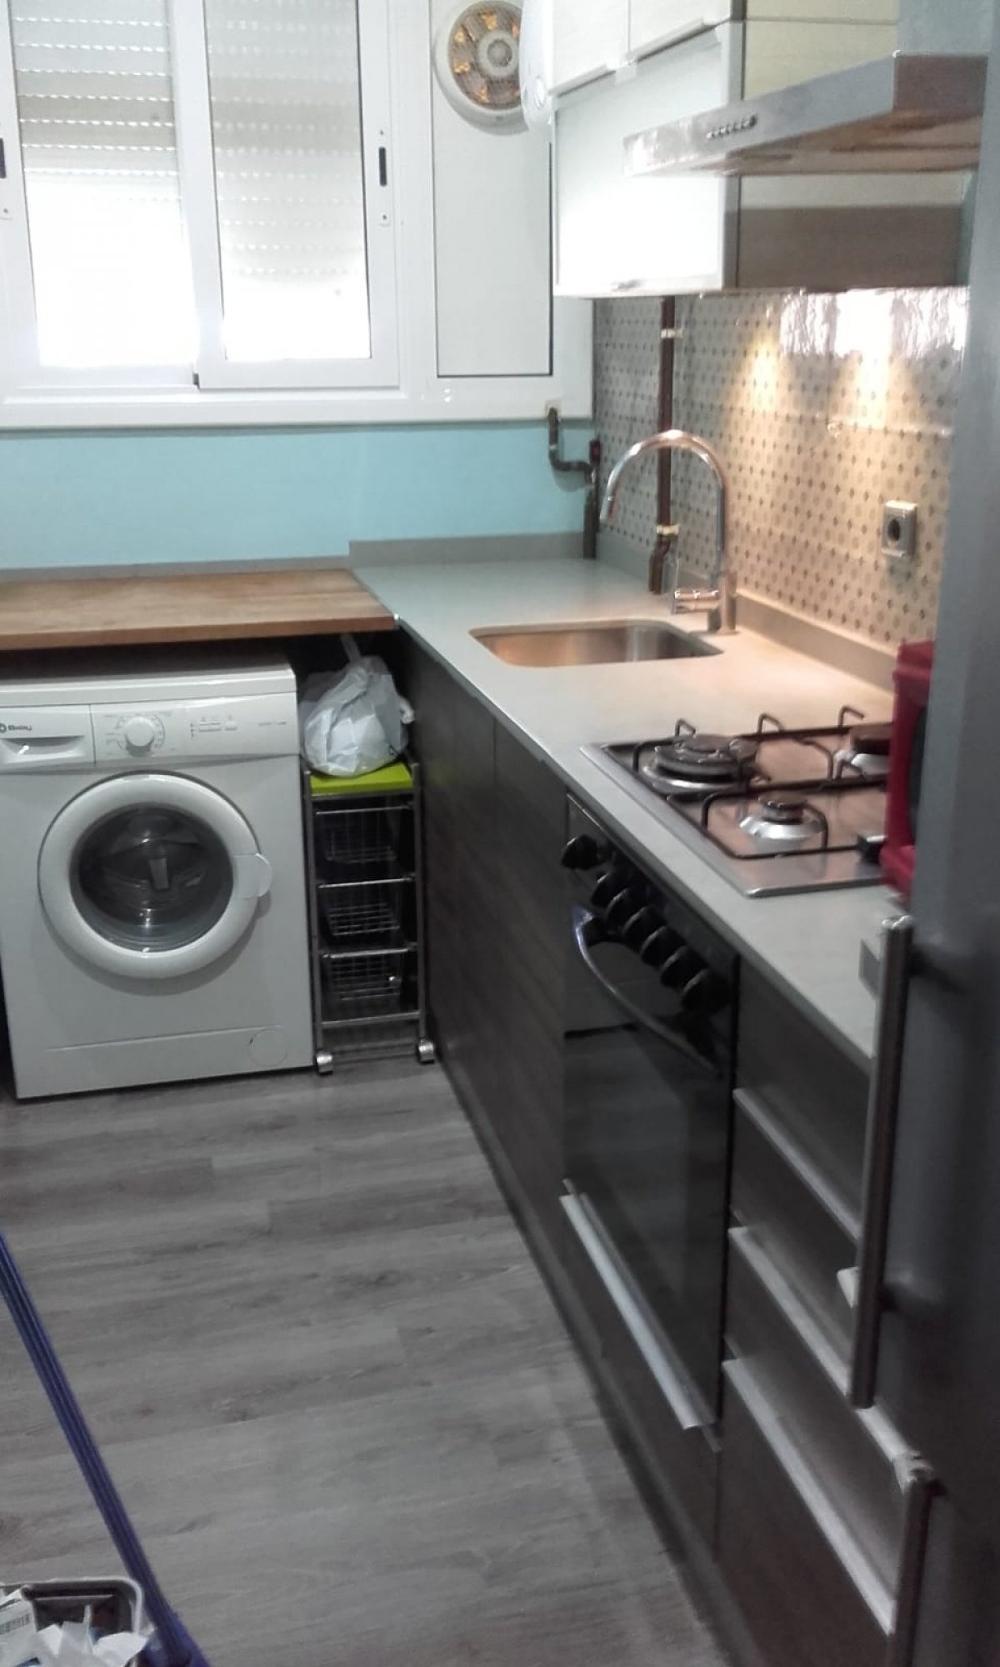 nou barris-prosperitat barcelona piso foto 3759396